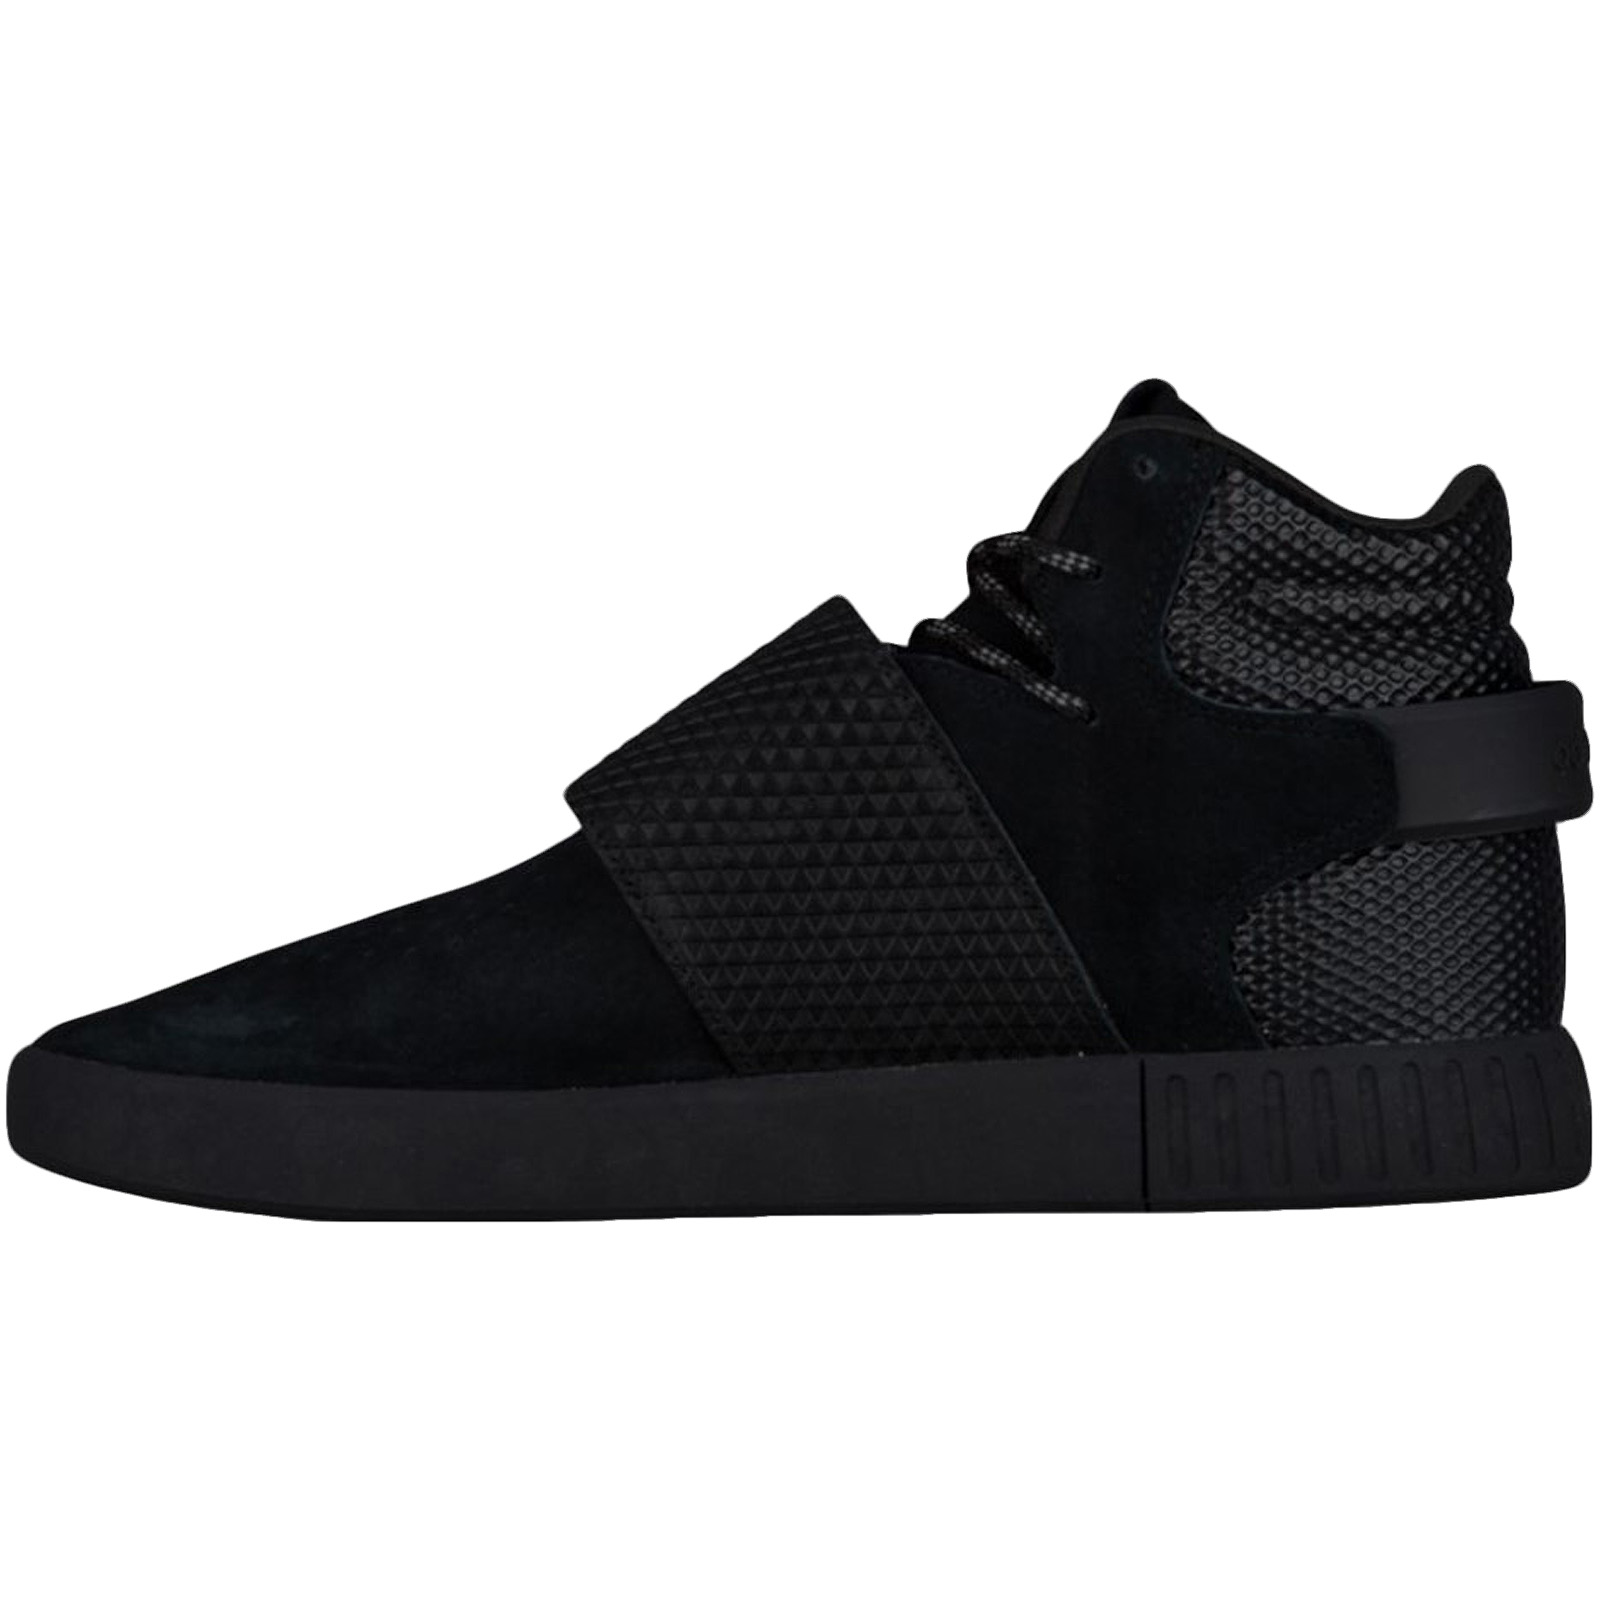 adidas-Originals-Mens-Tubular-Invader-Strap-Casual-Lace-Up-Hi-Top-Trainers-Shoes thumbnail 7